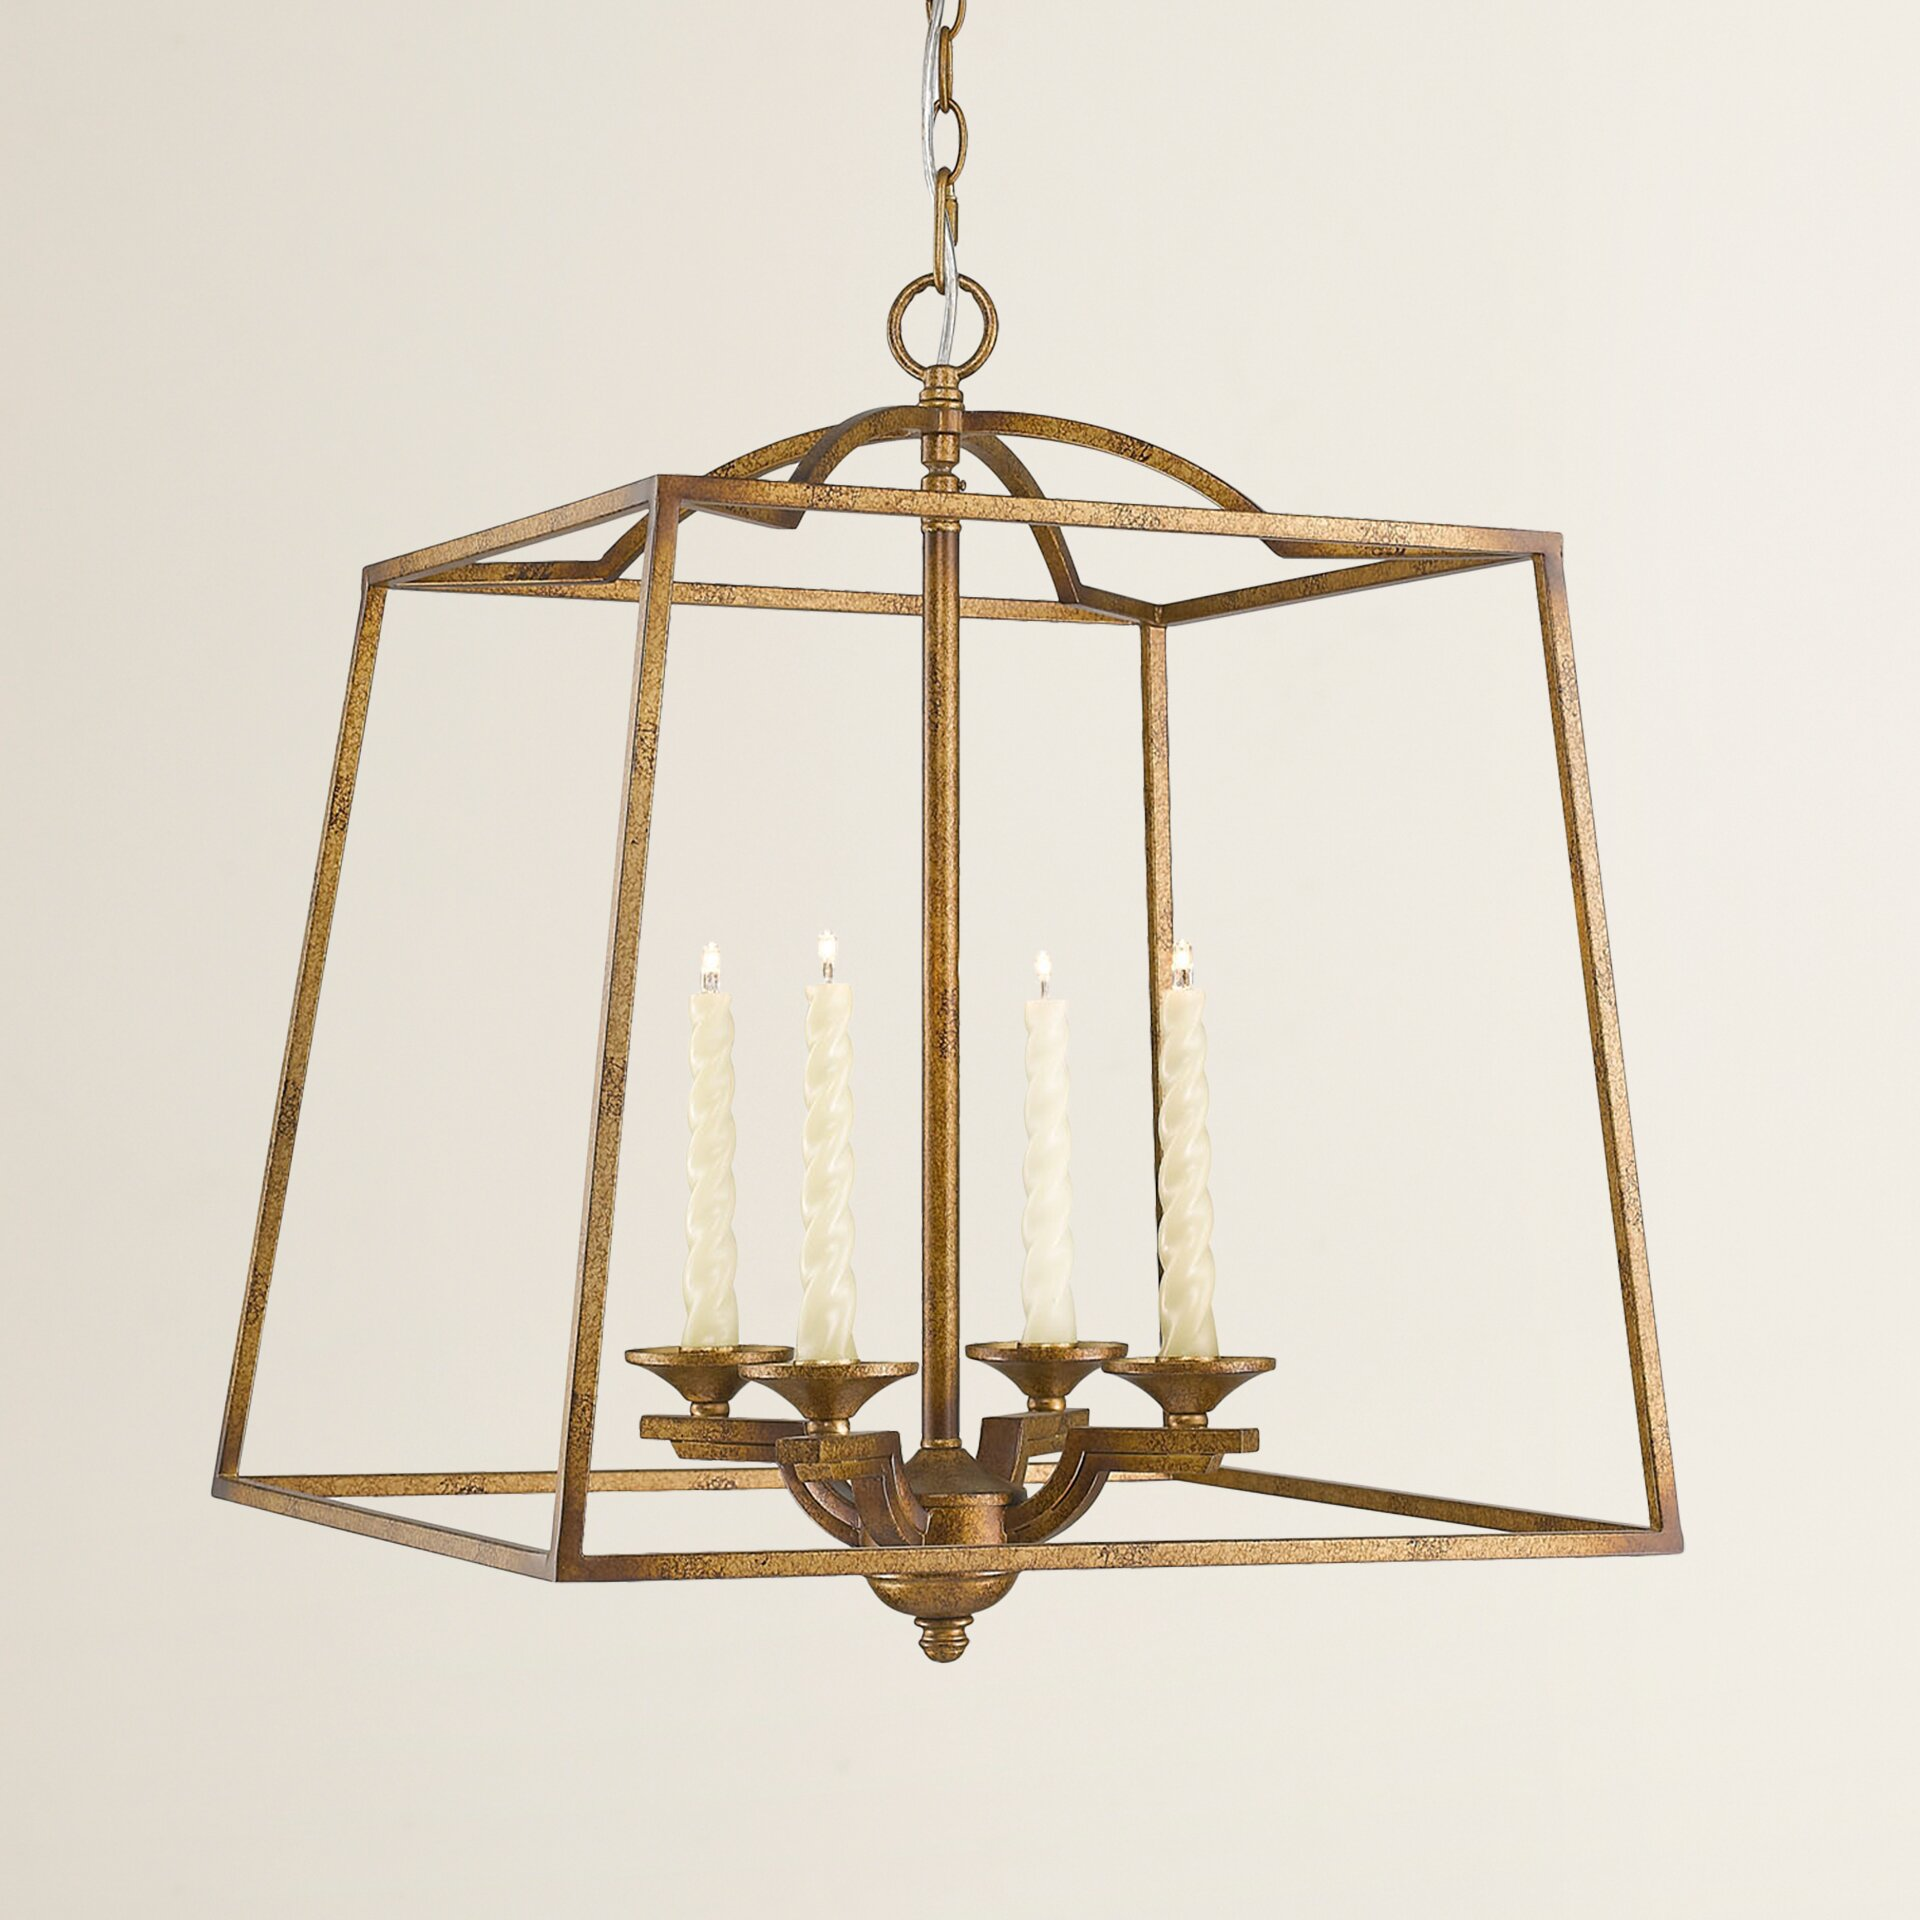 House Of Hampton Gambon 4 Light Candle Style Chandelier